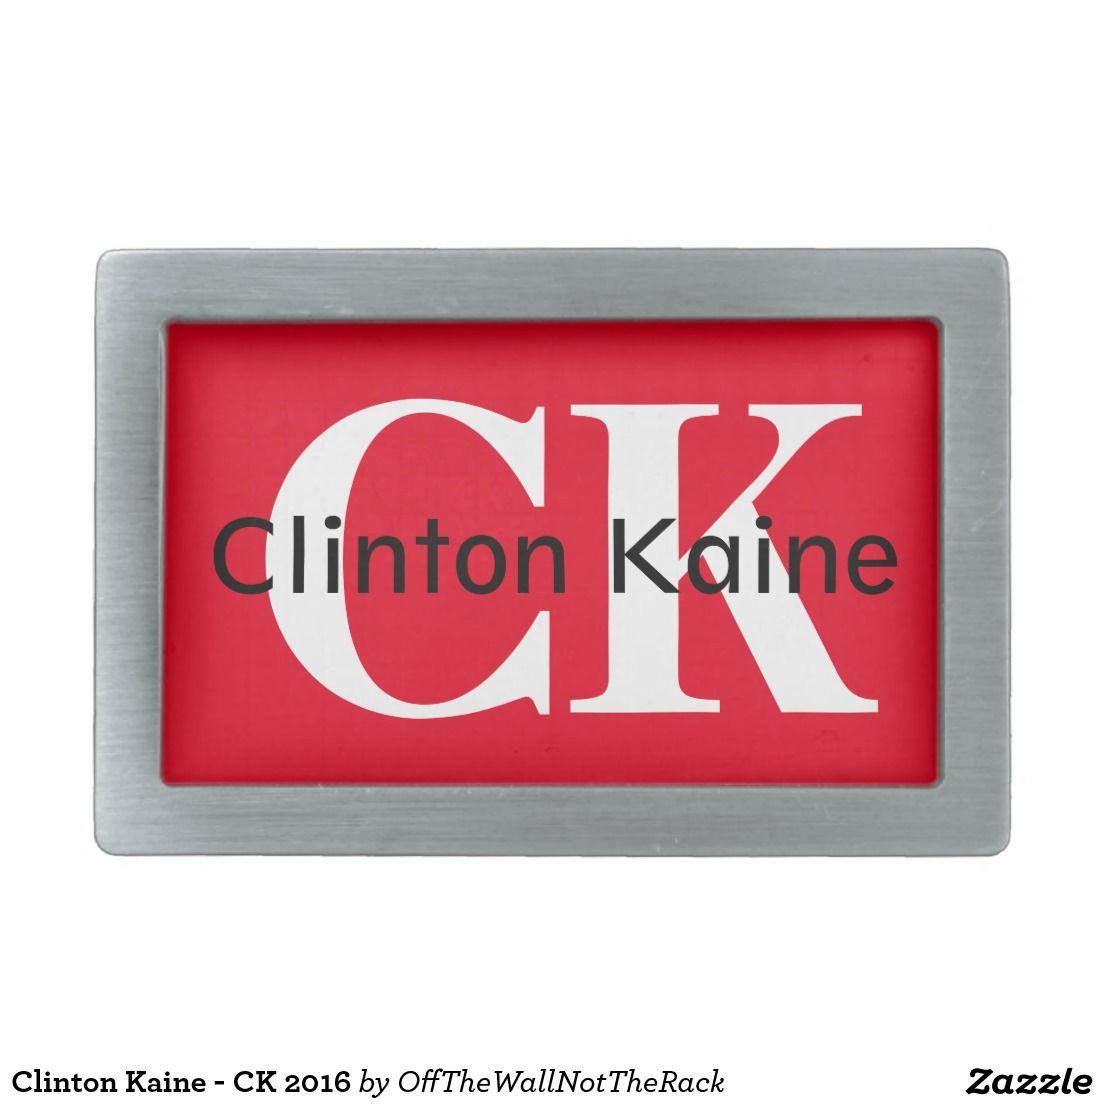 Clinton Kaine - CK 2016 Belt Buckle